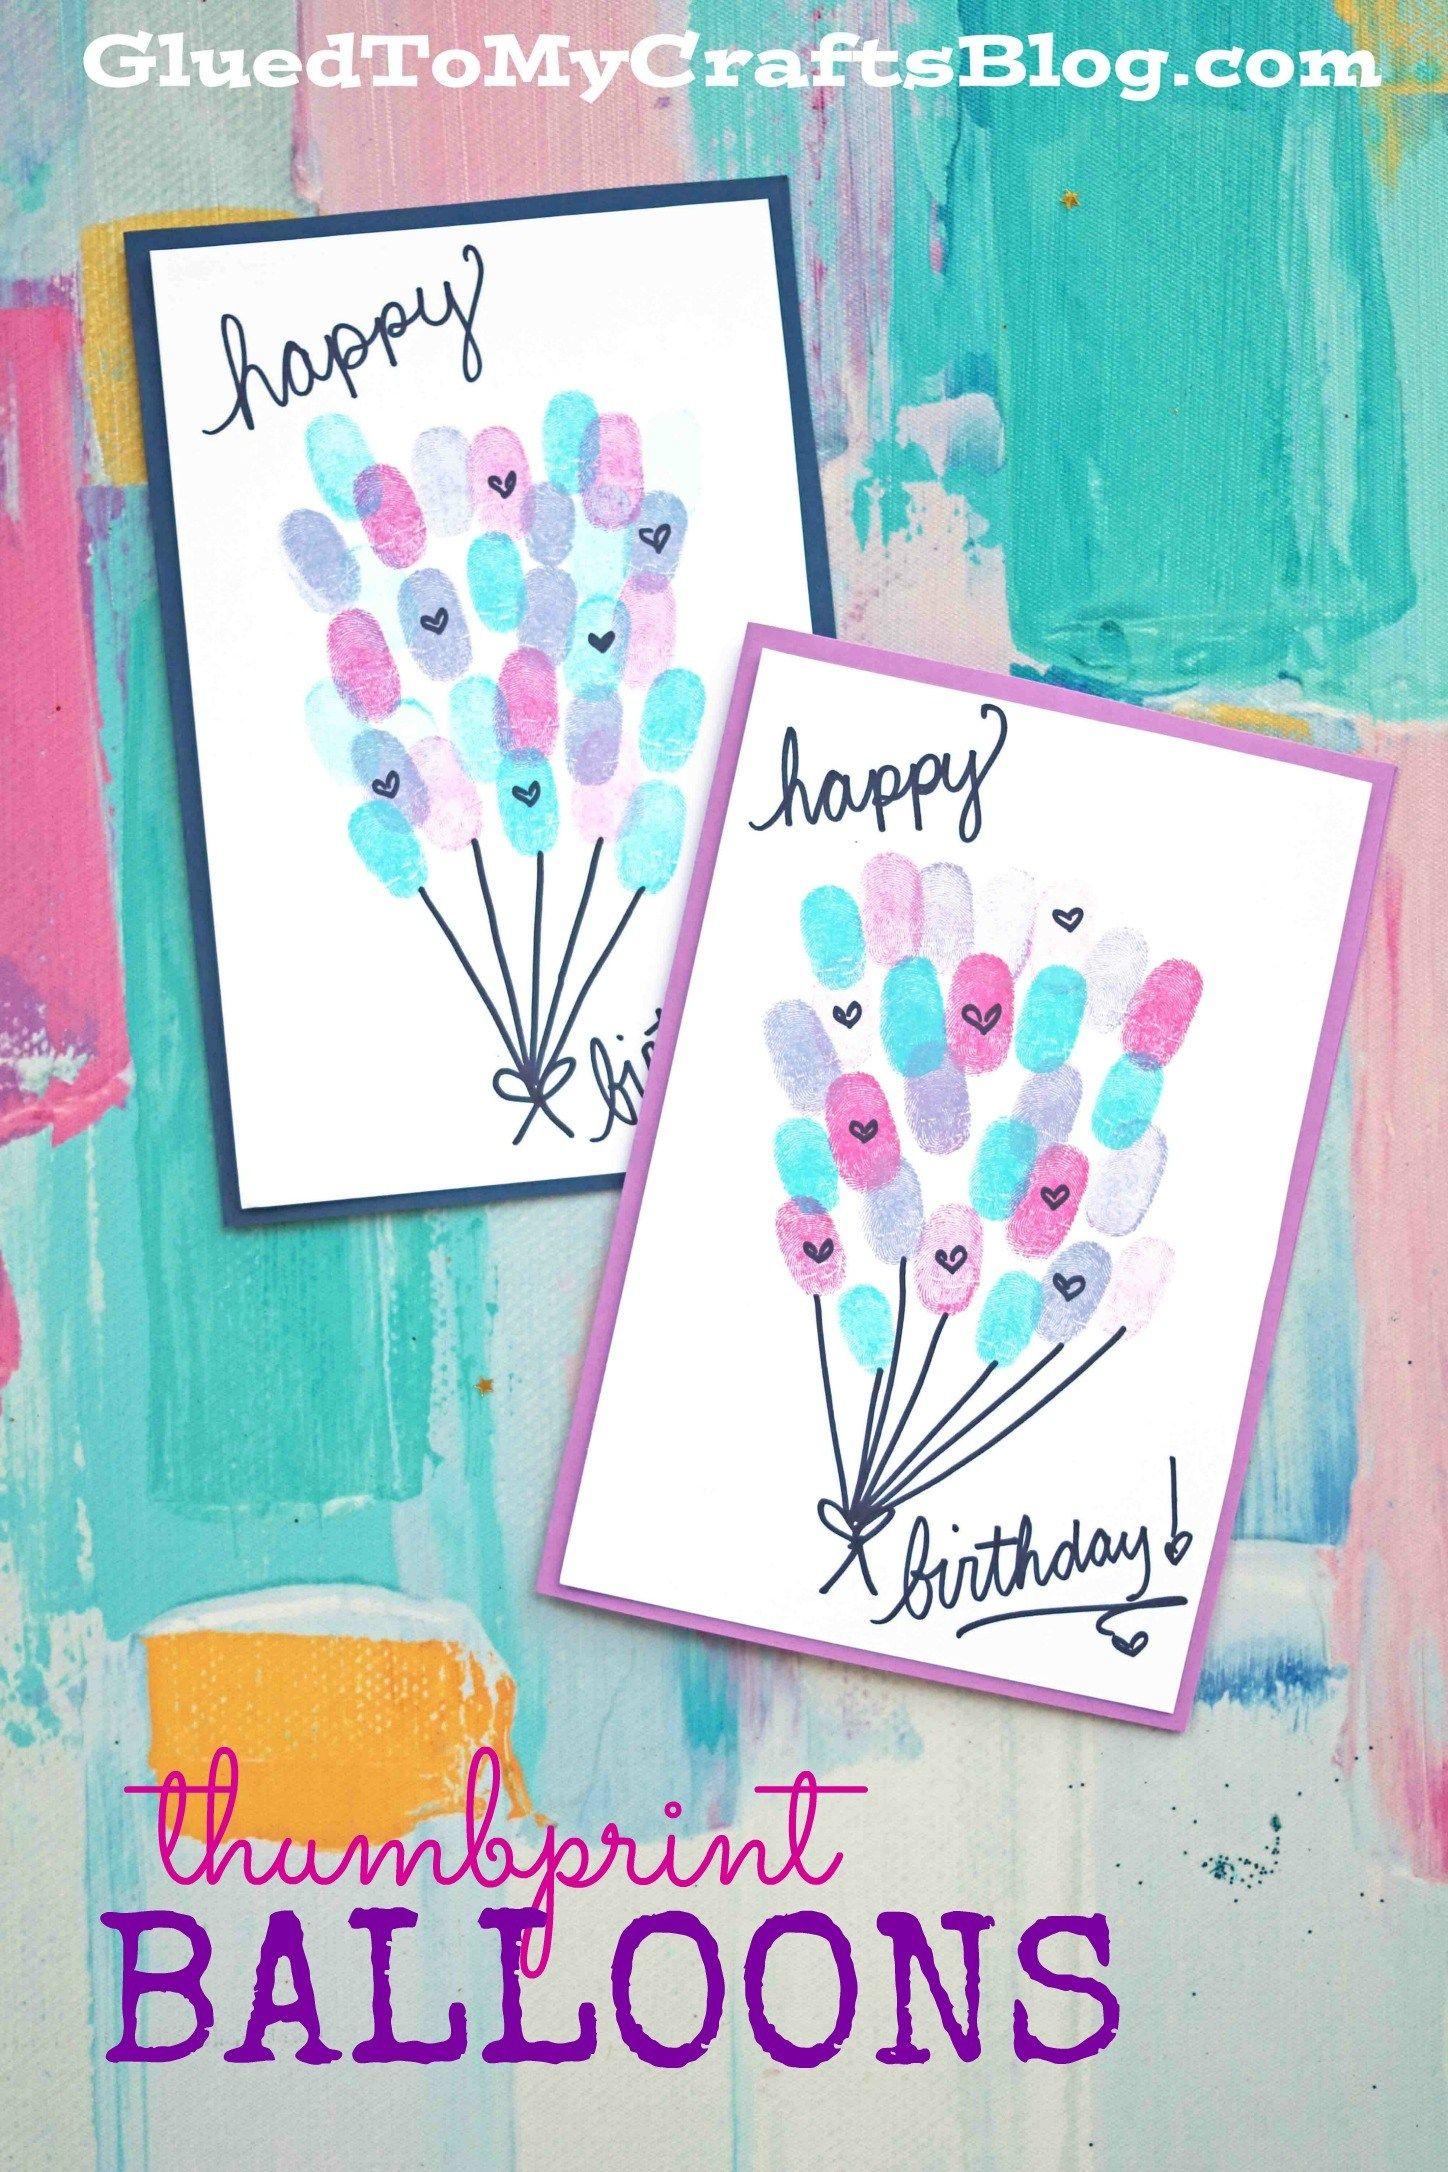 thumbprint birthday balloons card idea  creative birthday